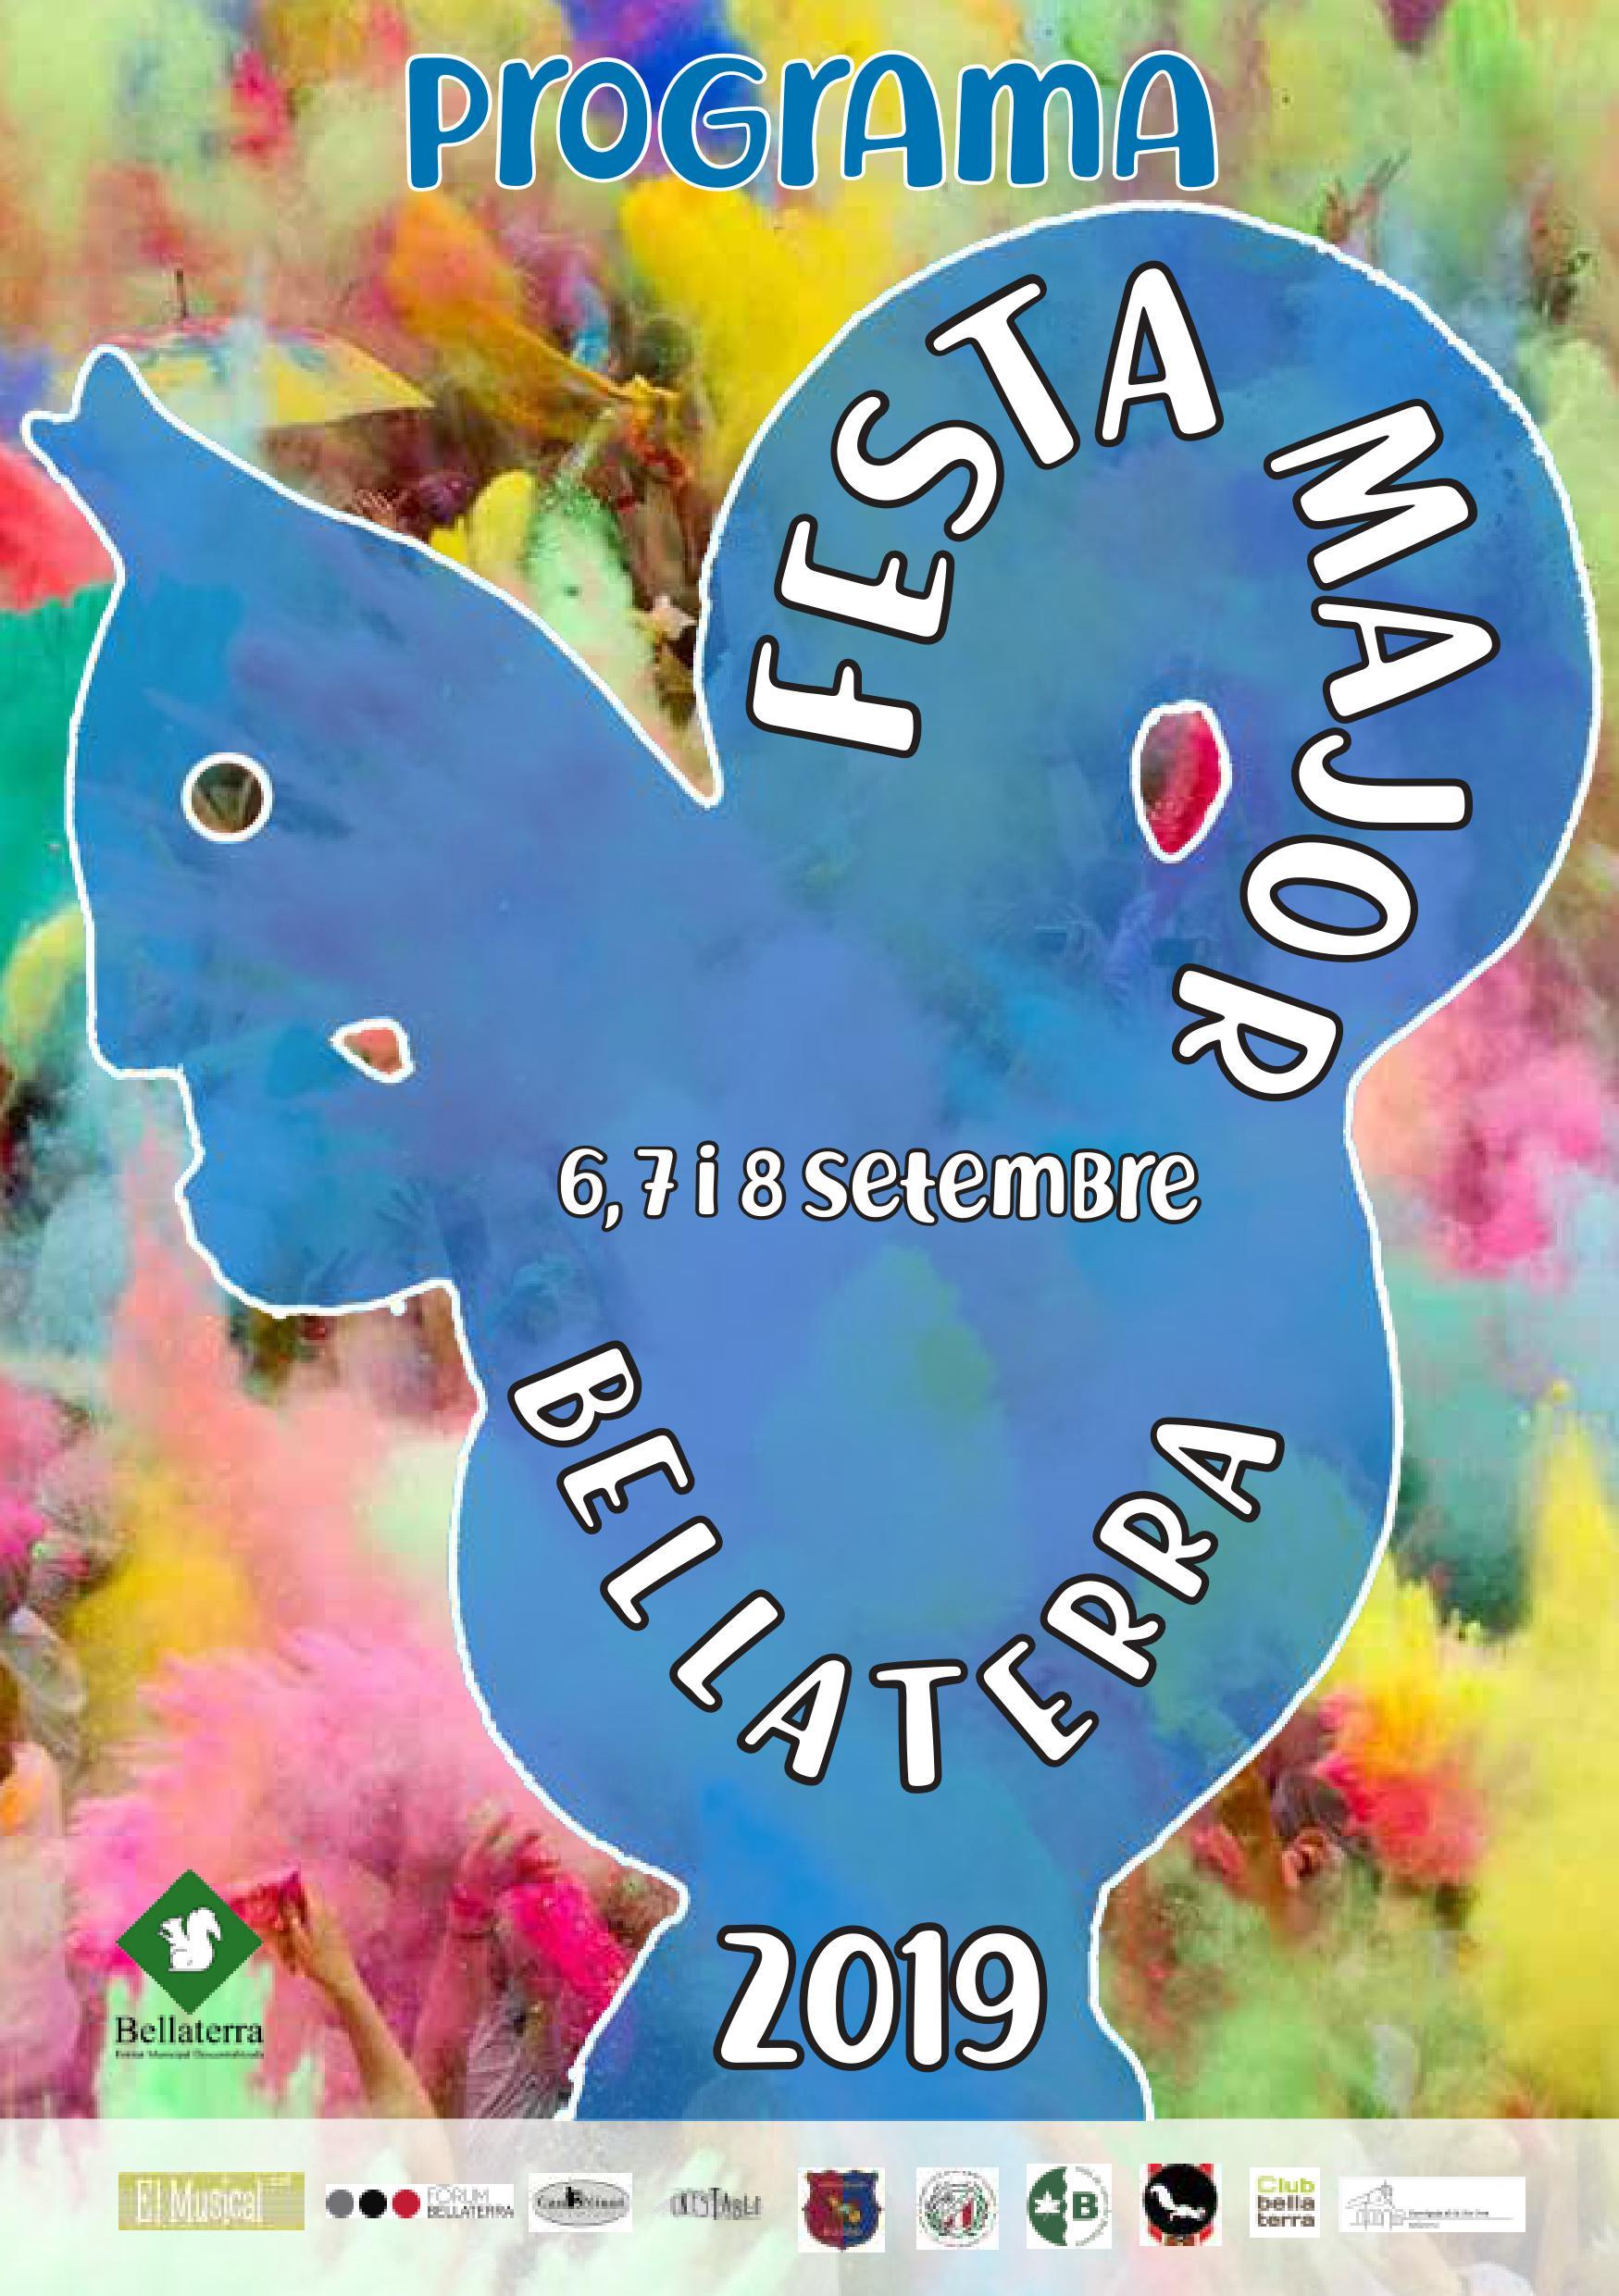 Cartell de la Festa Major de Bellaterra 2019